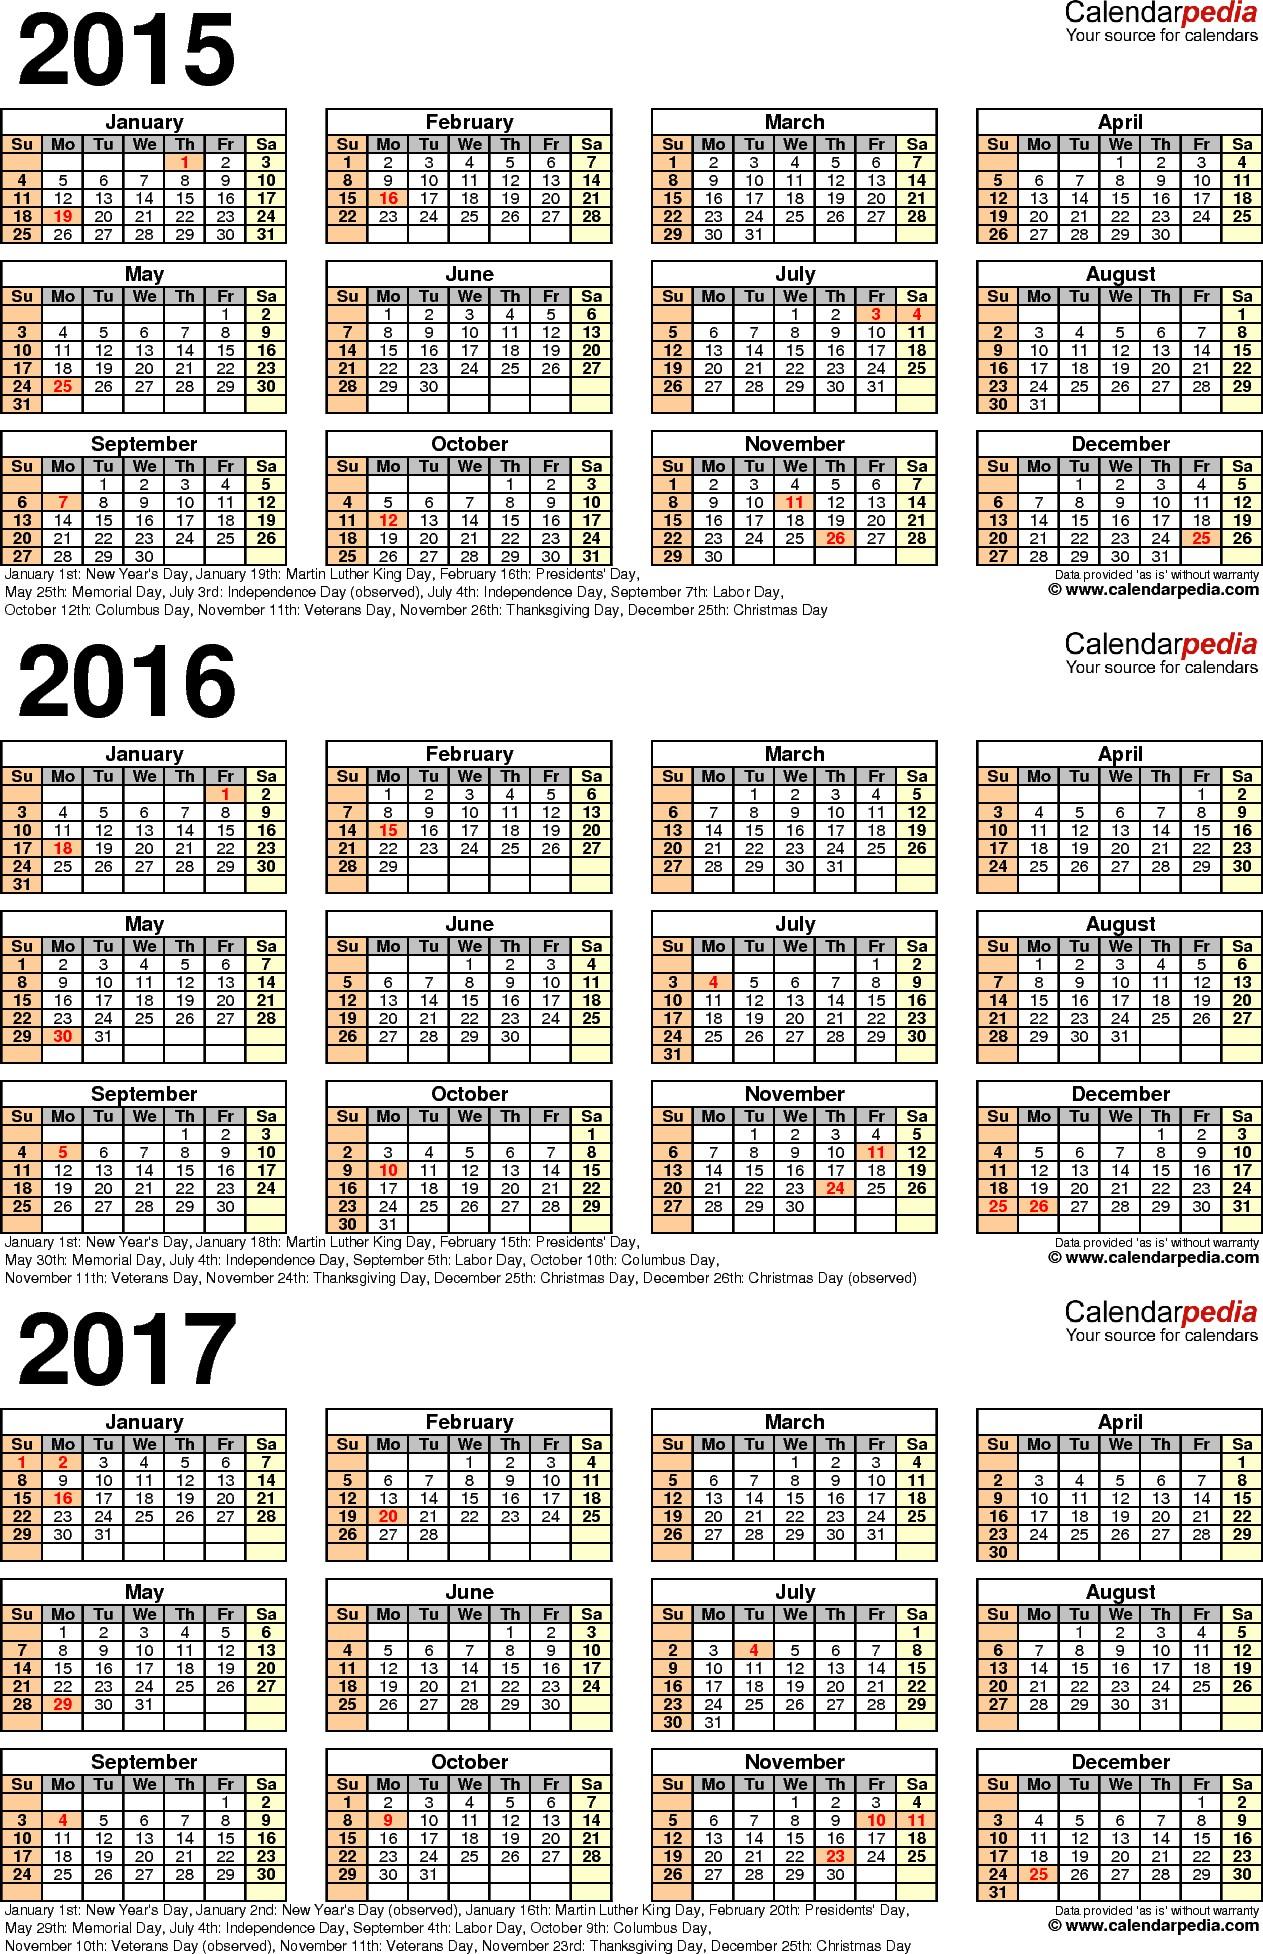 Calendario 2019 Mexico En Excel Más Actual 2015 2016 2017 Calendar 4 Three Year Printable Pdf Calendars